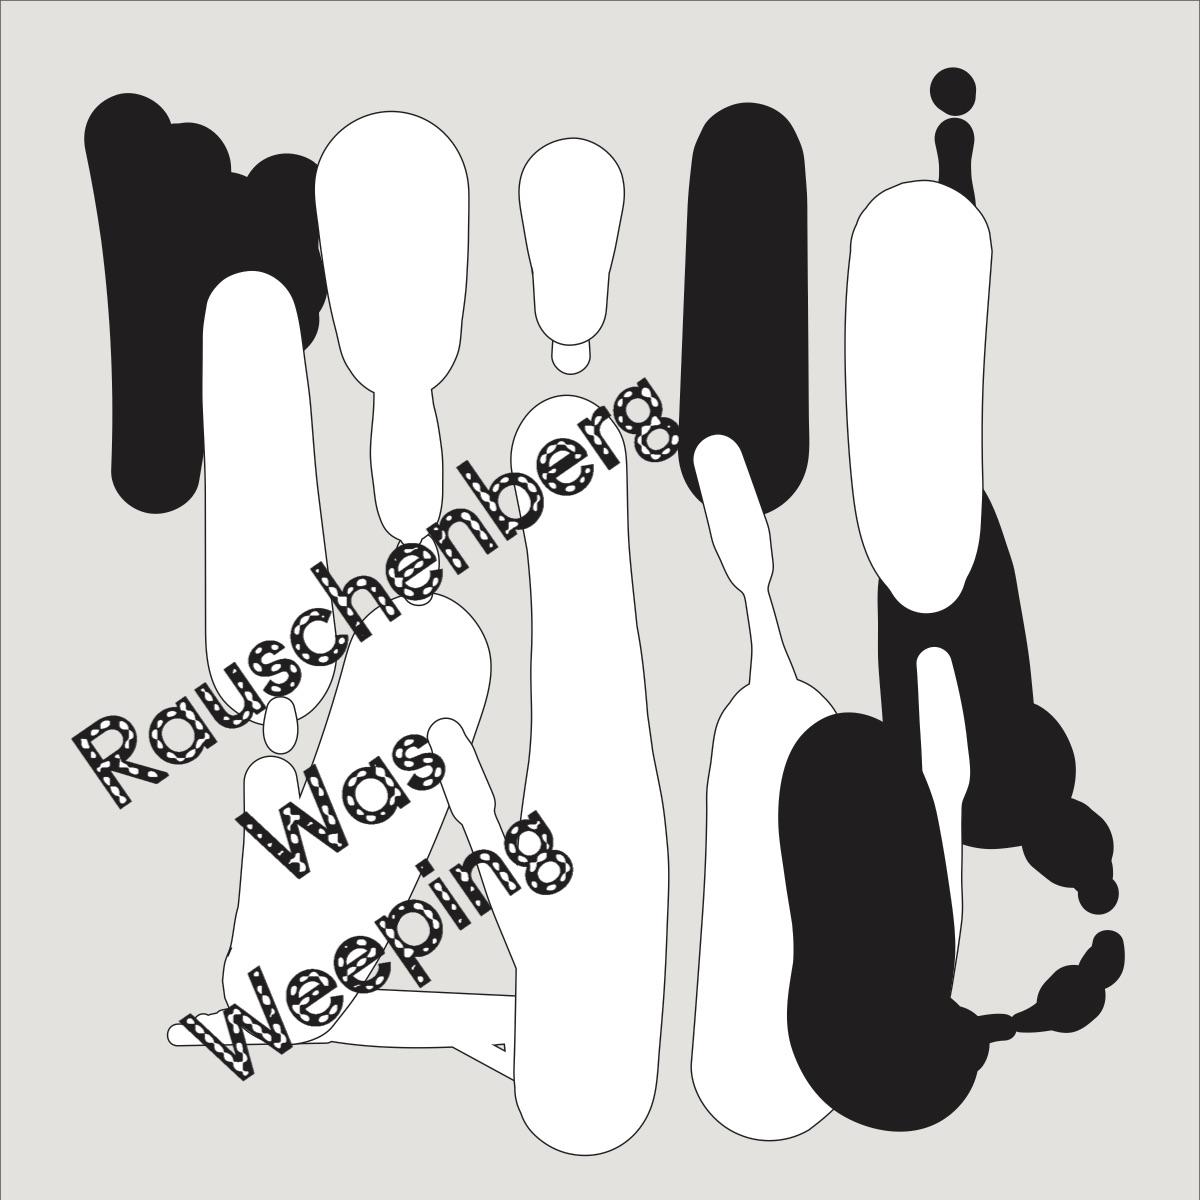 Rauschenberg cover.jpg